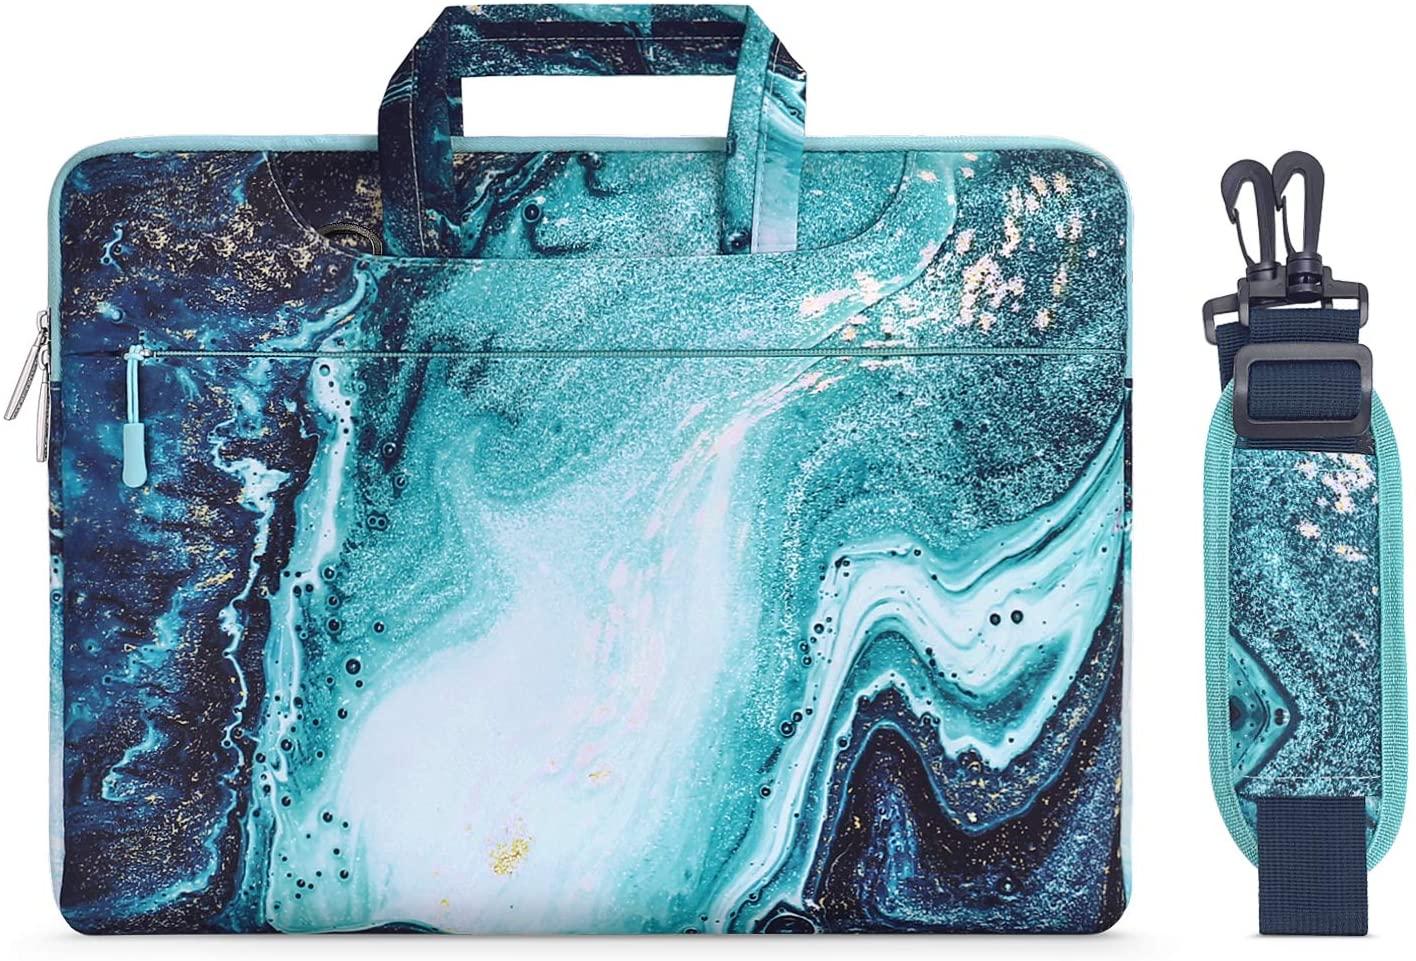 MOSISO Laptop Shoulder Bag Compatible with 13-13.3 inch MacBook Pro, MacBook Air, Notebook Computer, Creative Wave Marble Carrying Briefcase Handbag Sleeve Case